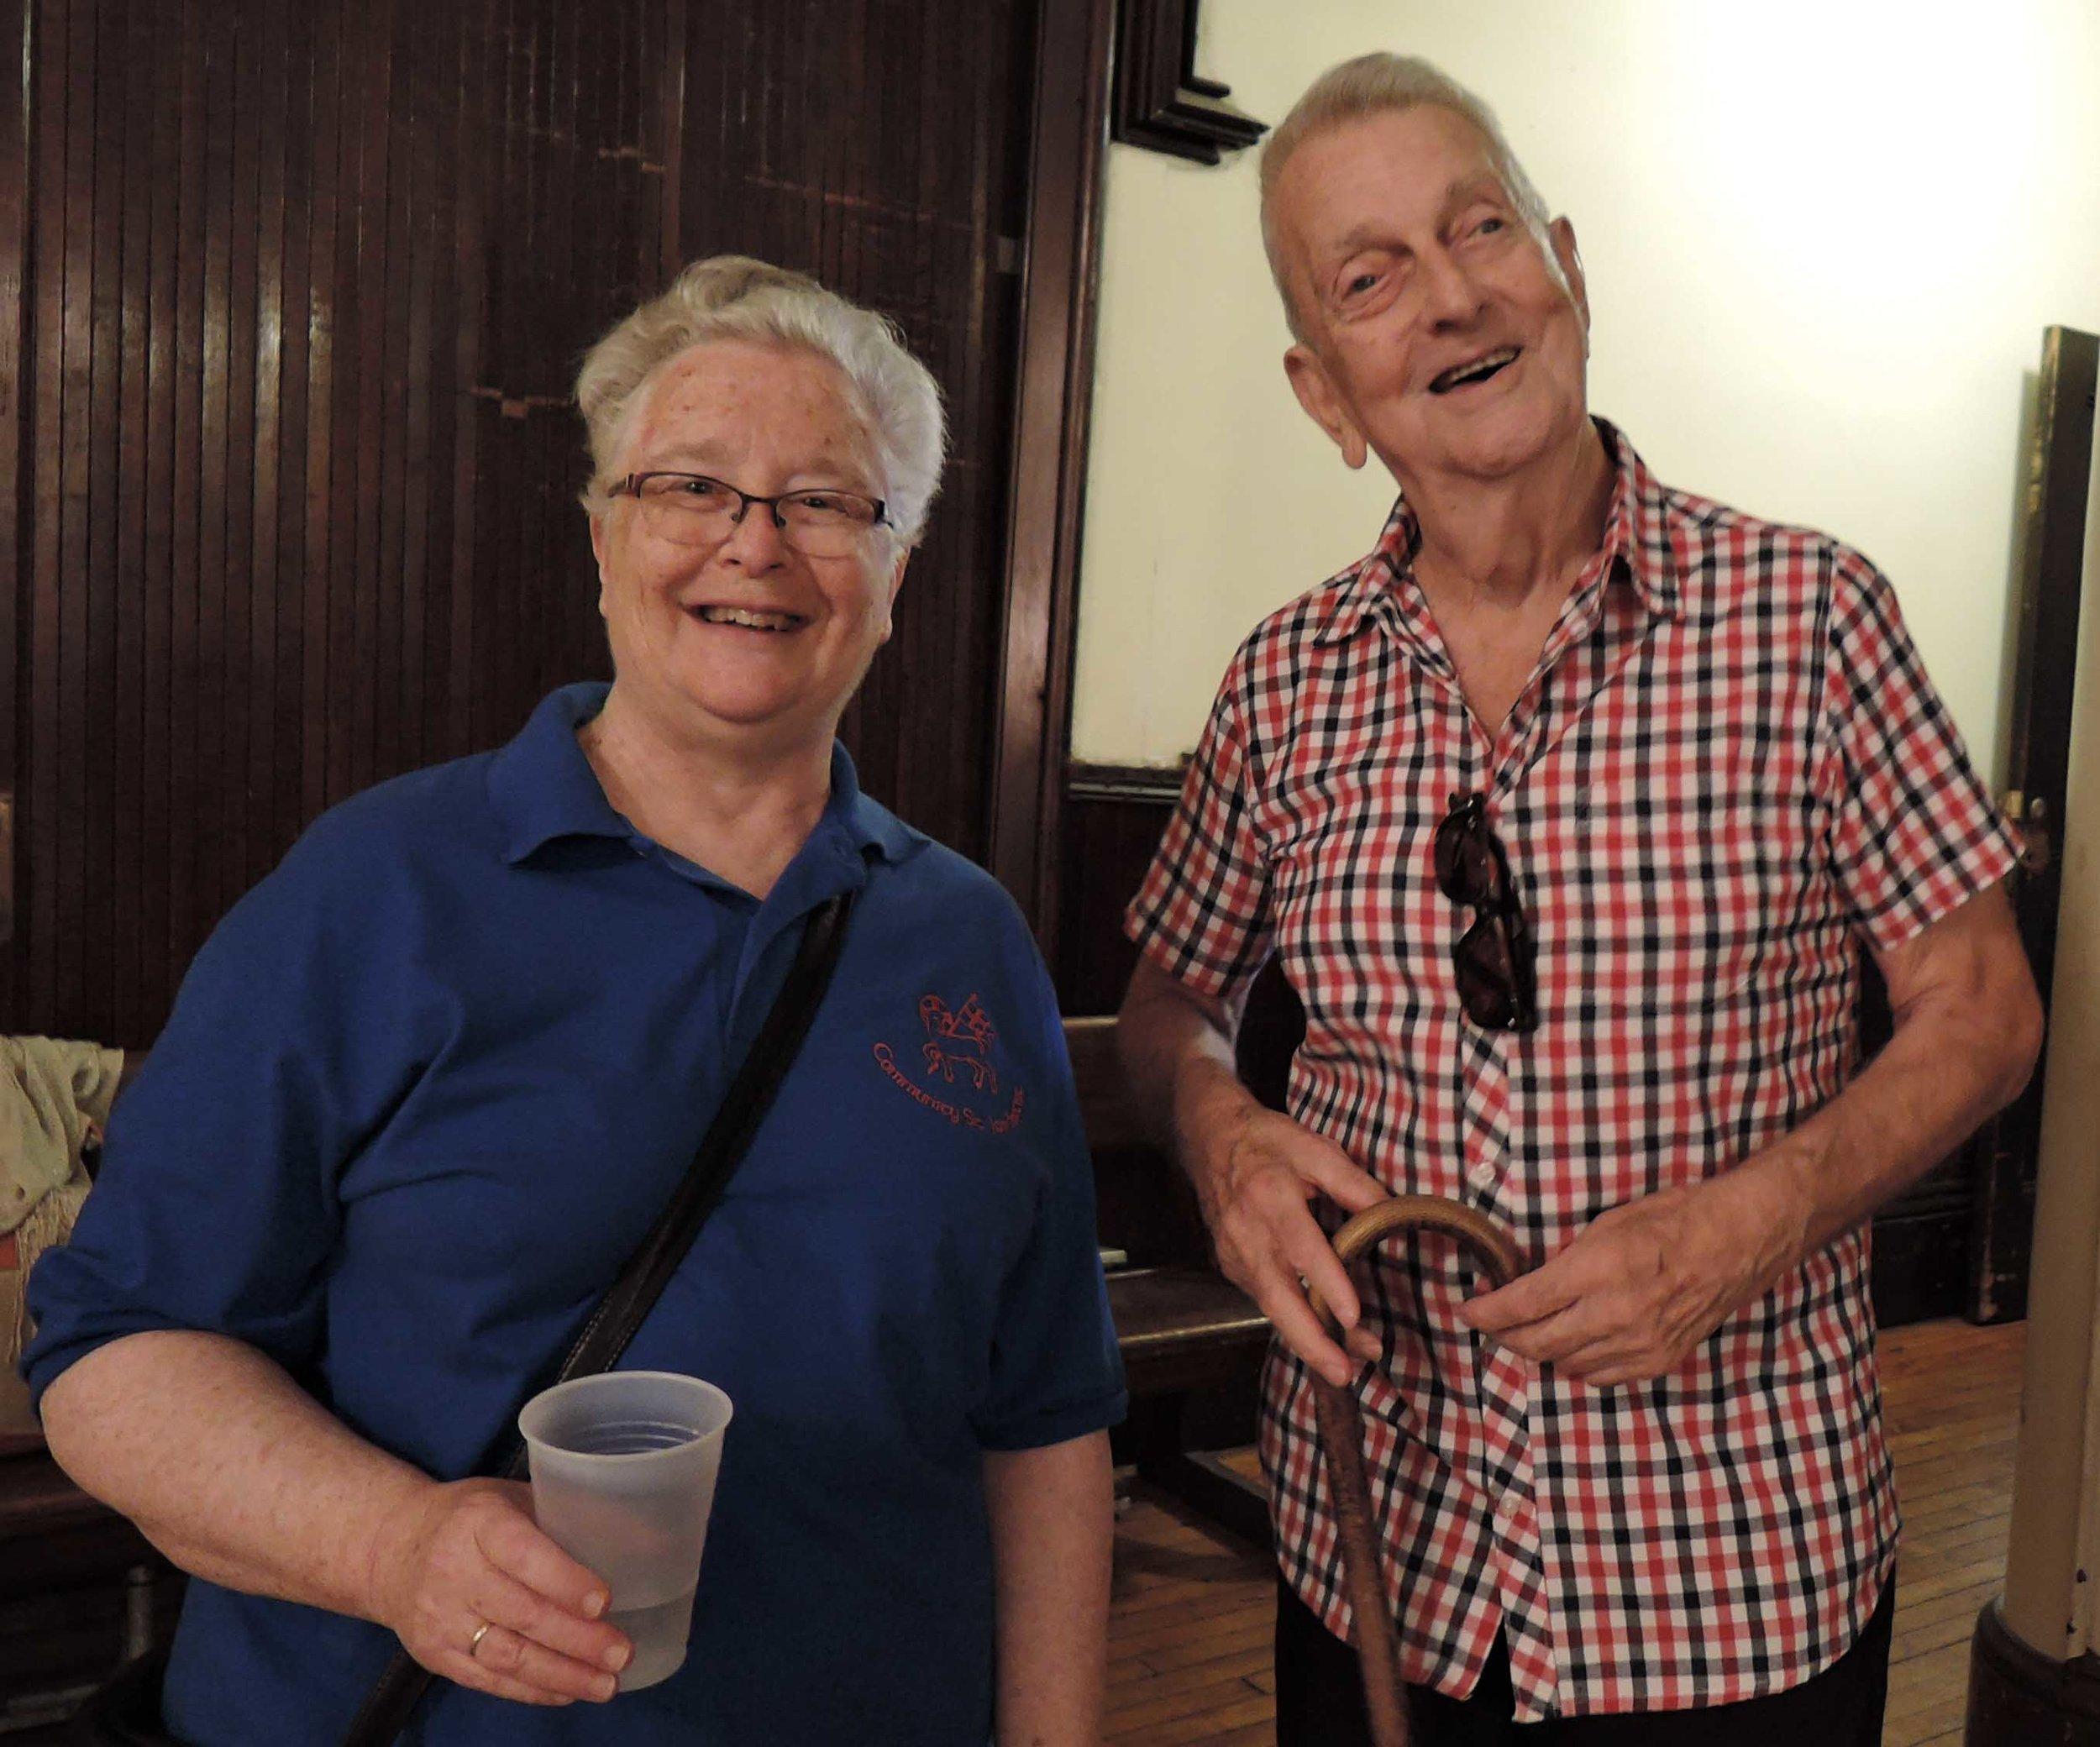 Sr. Deborah Francis, C.S.J.B. and Dick Leitsch after Mass.